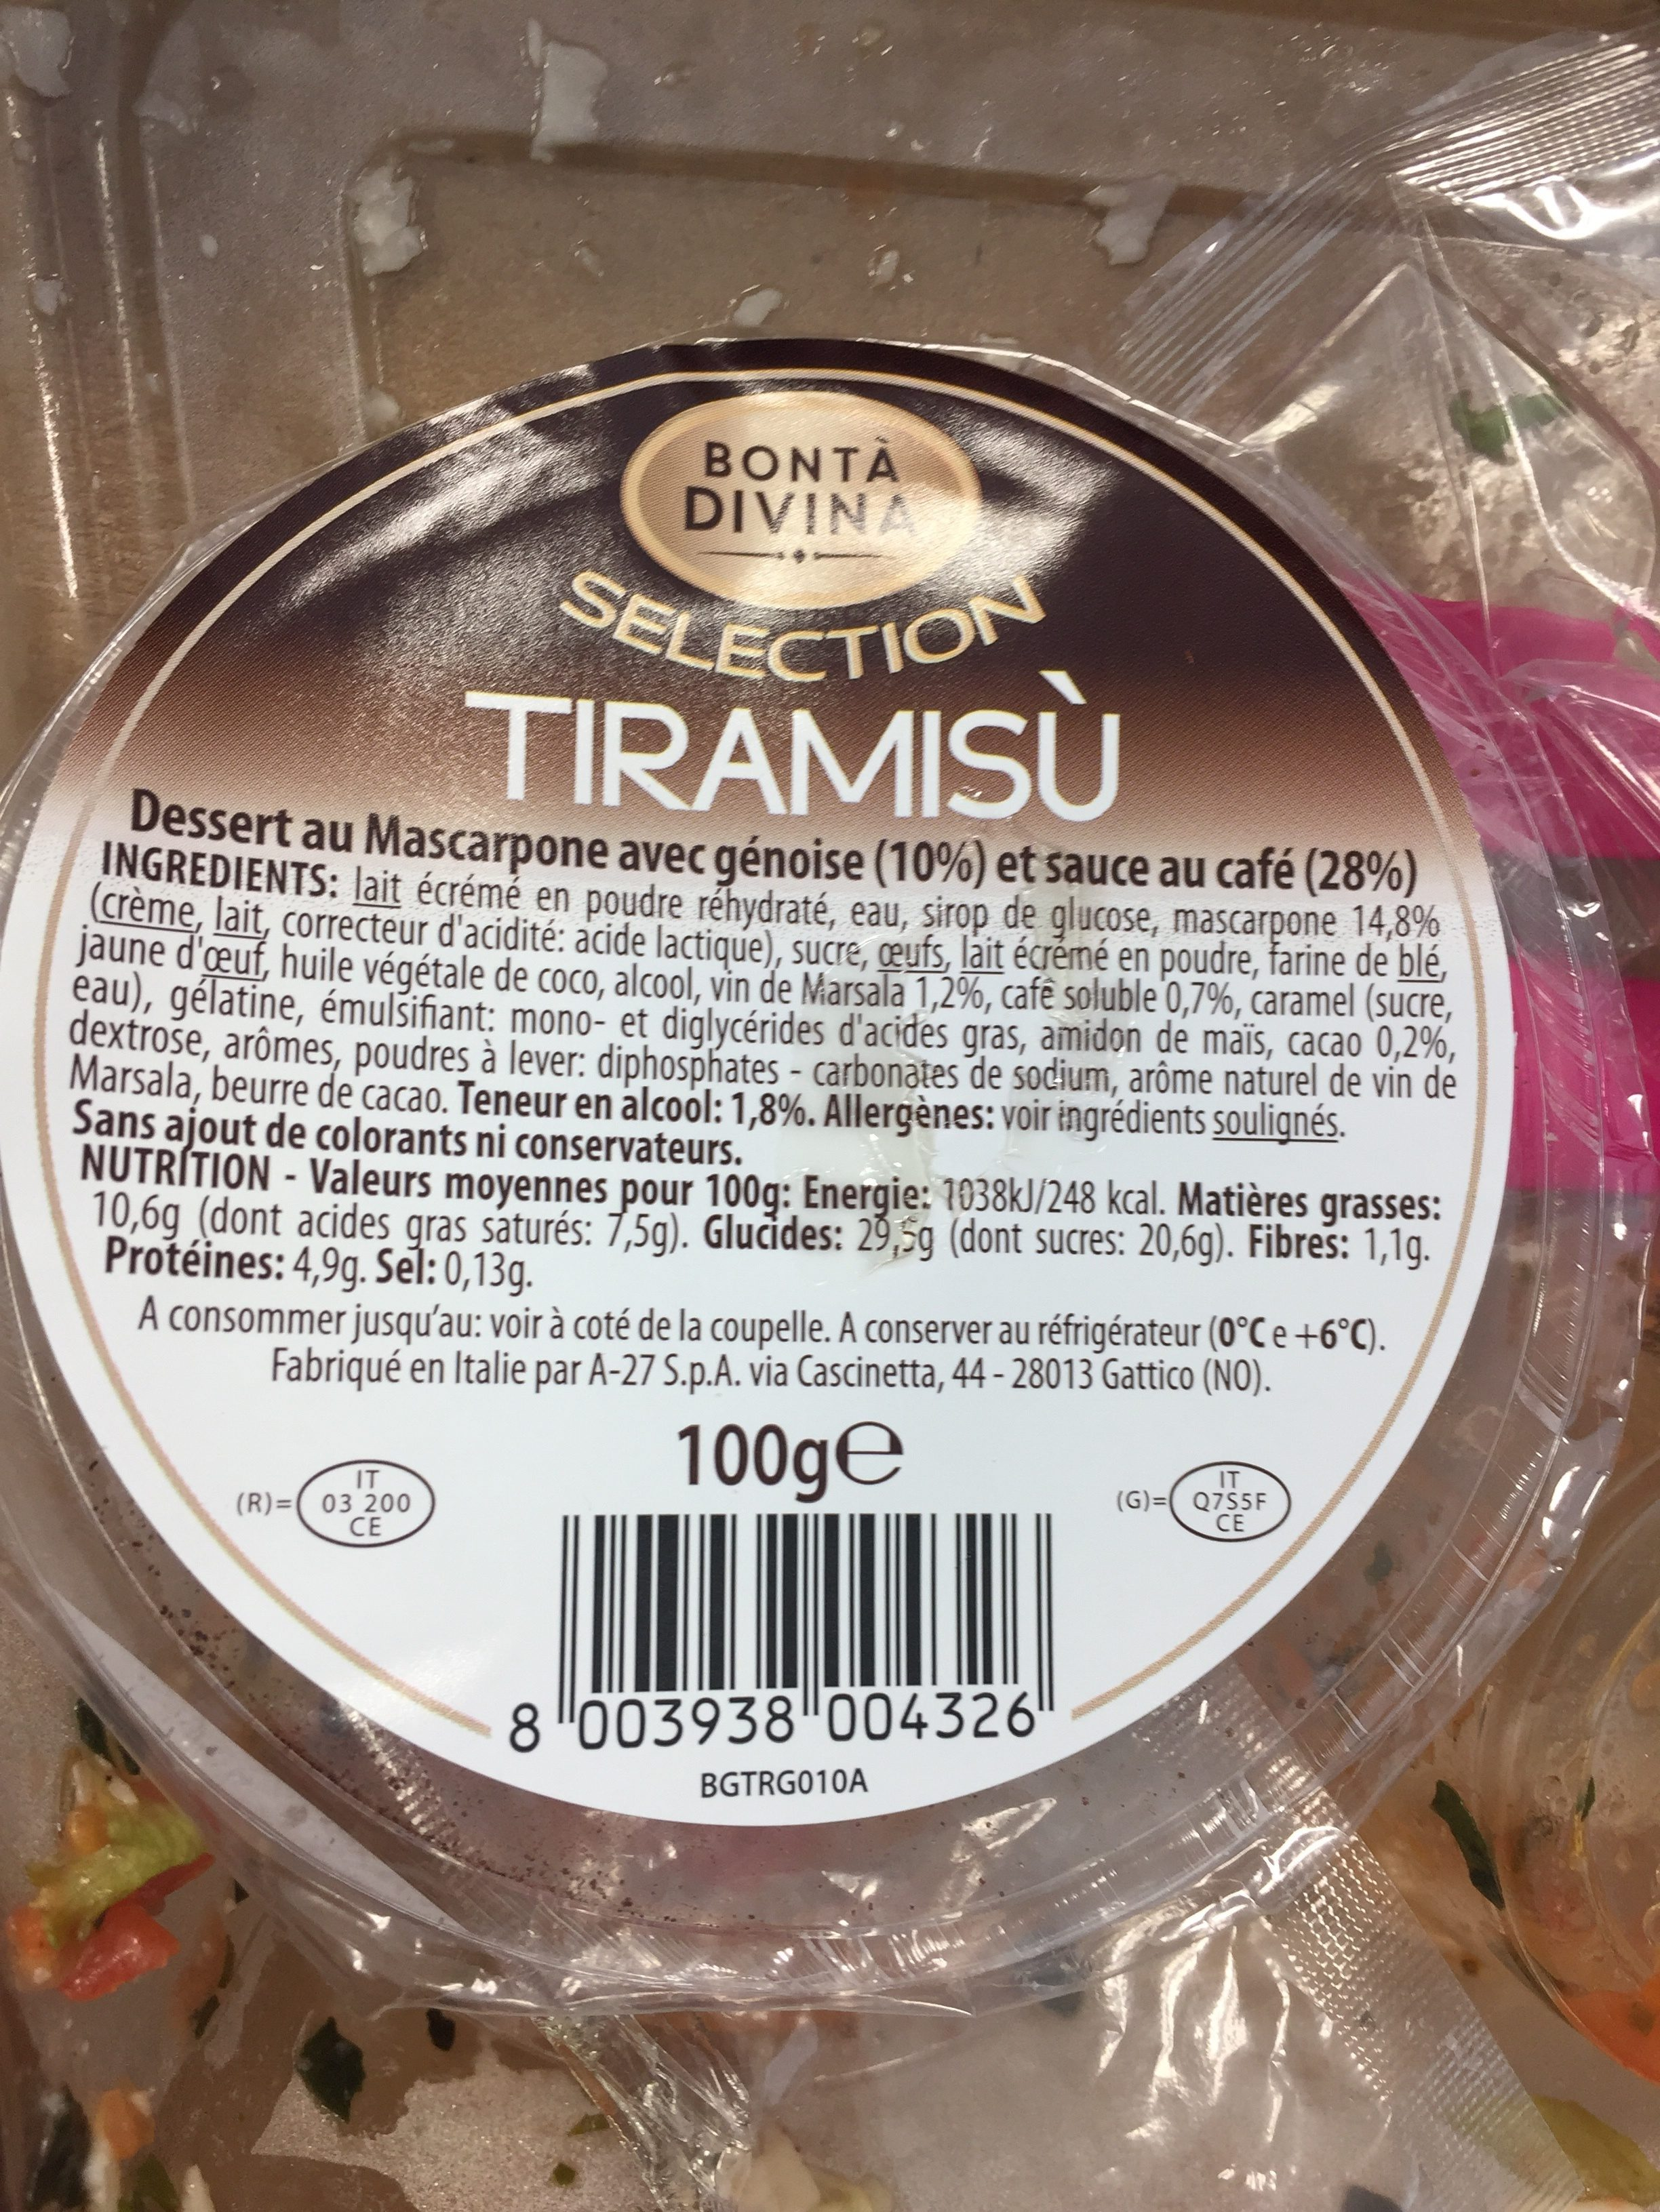 Bonta Divina Selection Tiramisu le pot de 100 g - Ingredients